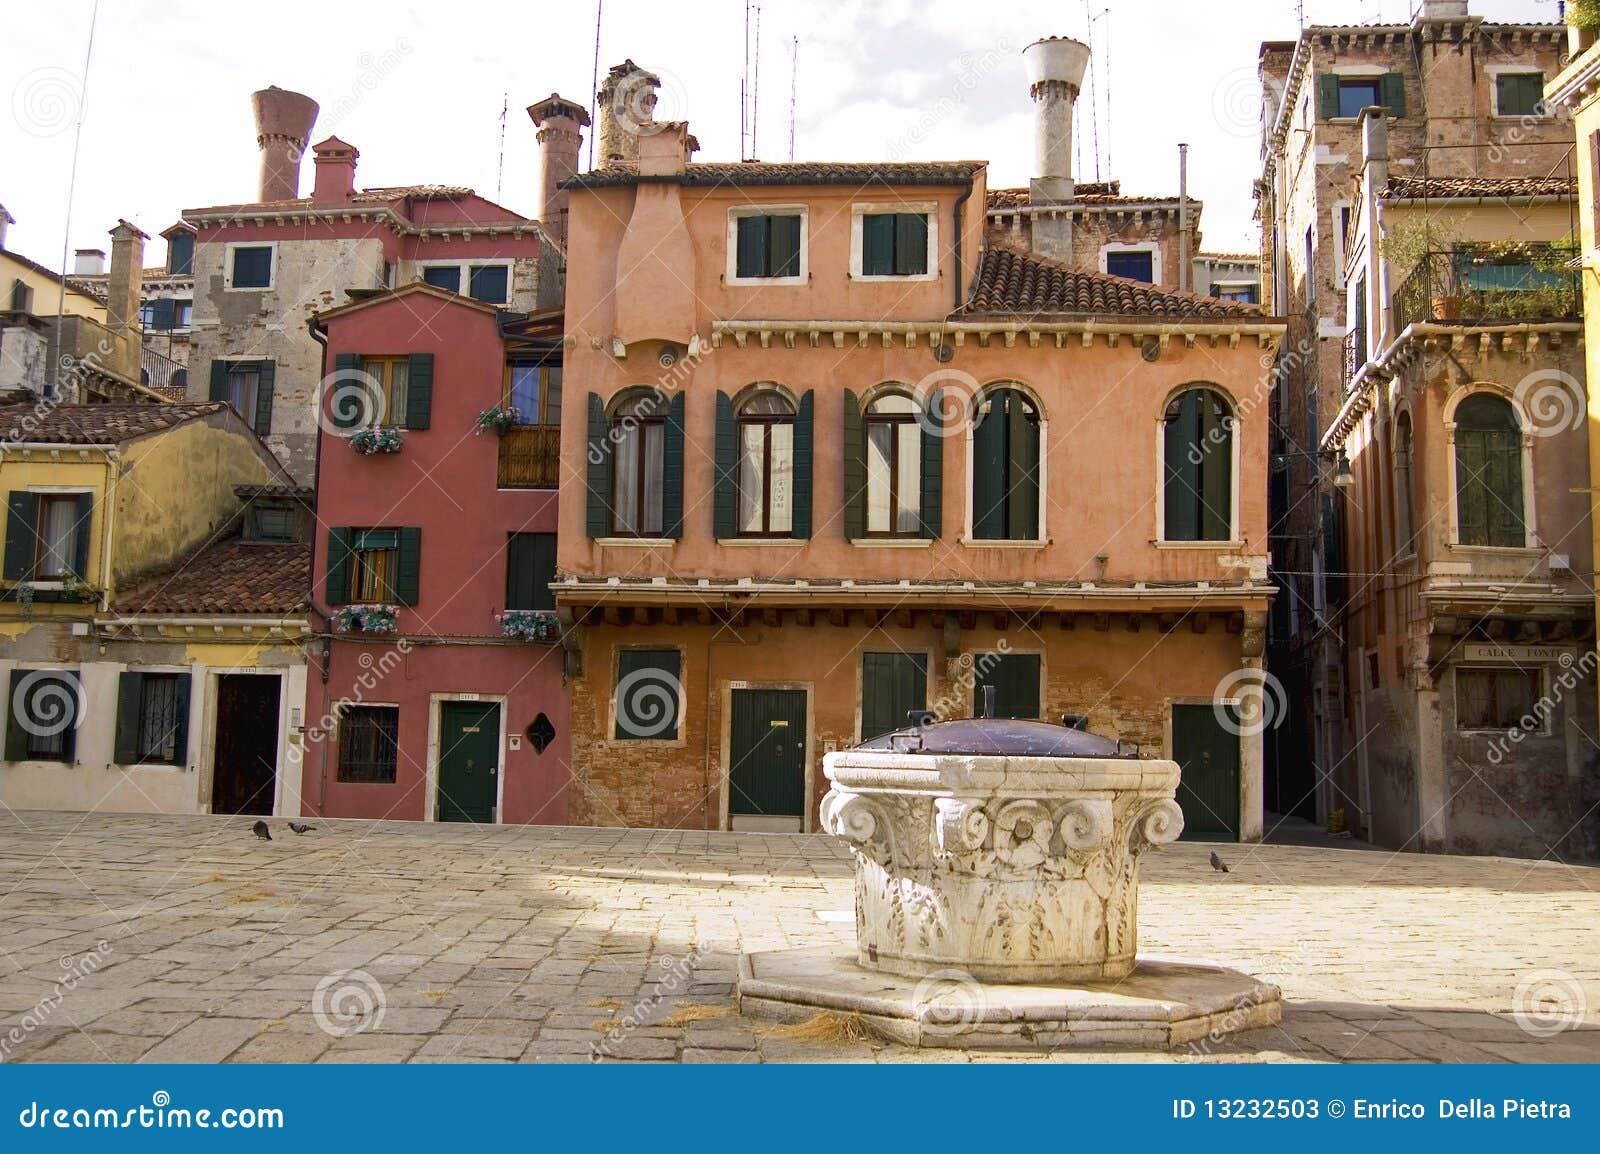 venetian architecture stock photos image 13232503